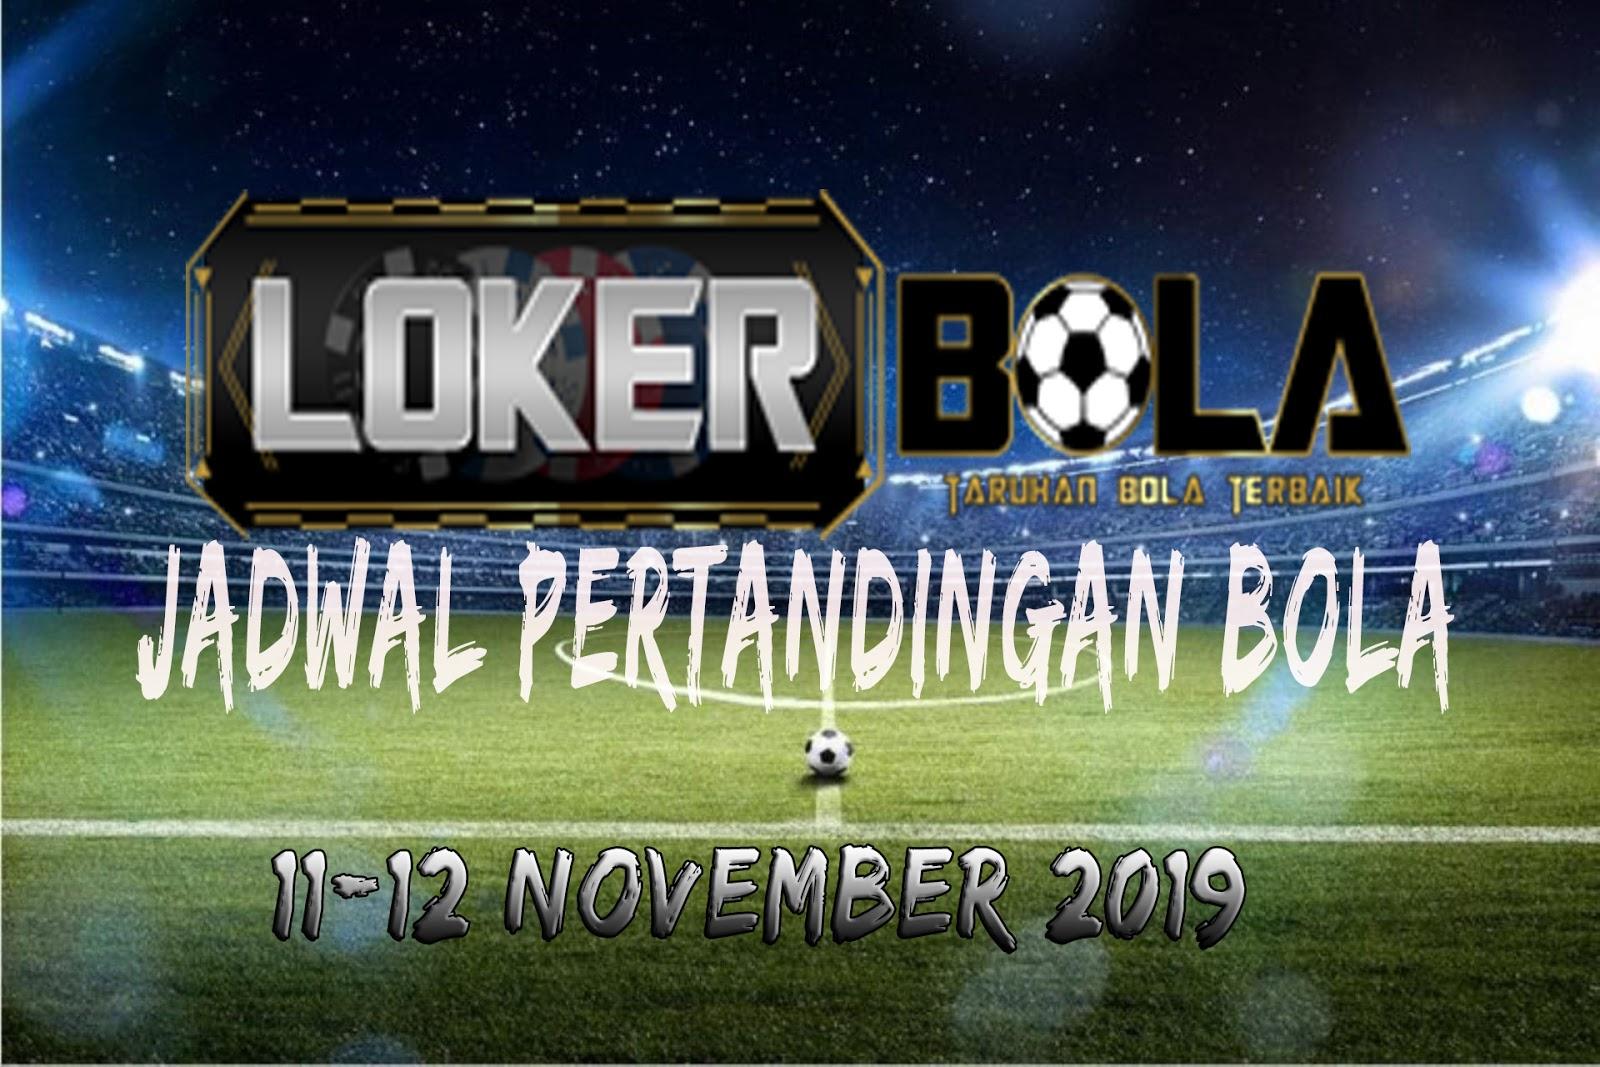 JADWAL PERTANDINGAN BOLA 11 – 12 NOVEMBER 2019